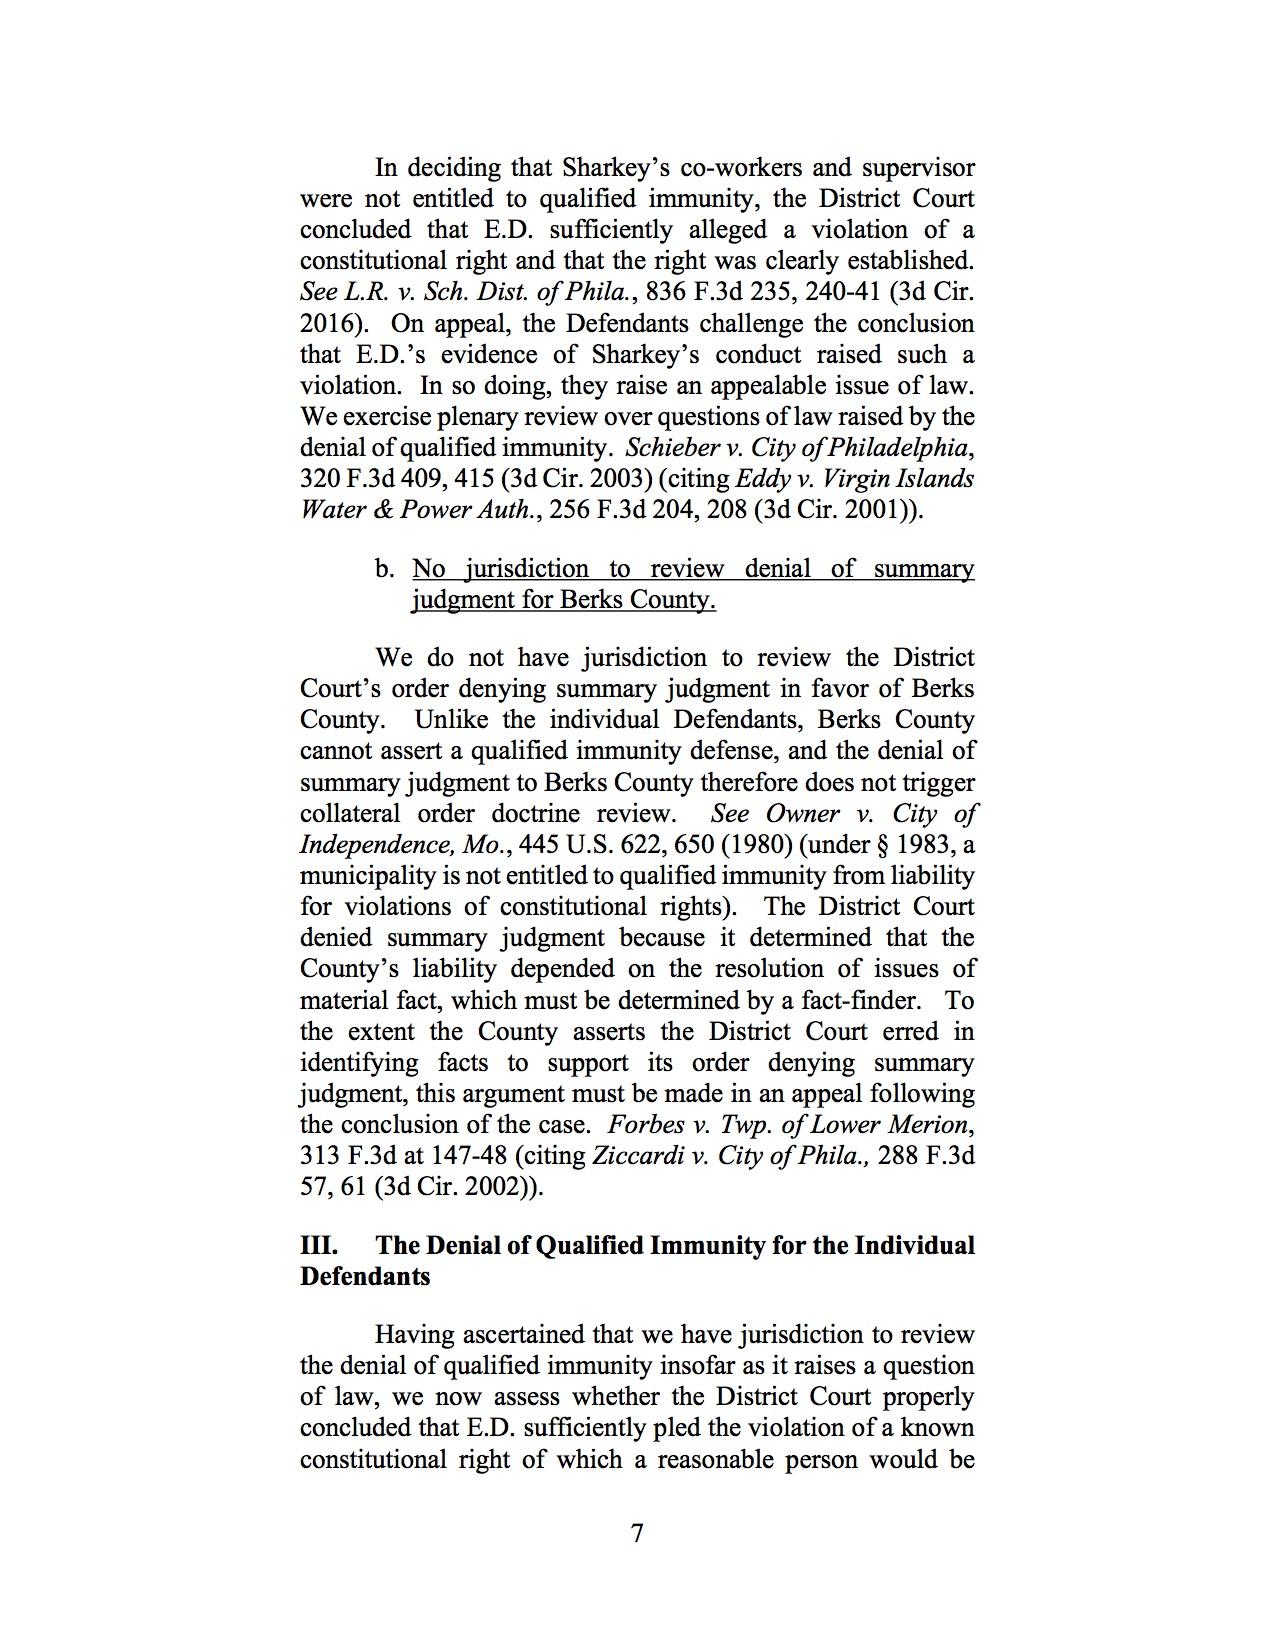 E.D. v. Sharkey 3rd Circuit Opinion.7.jpg